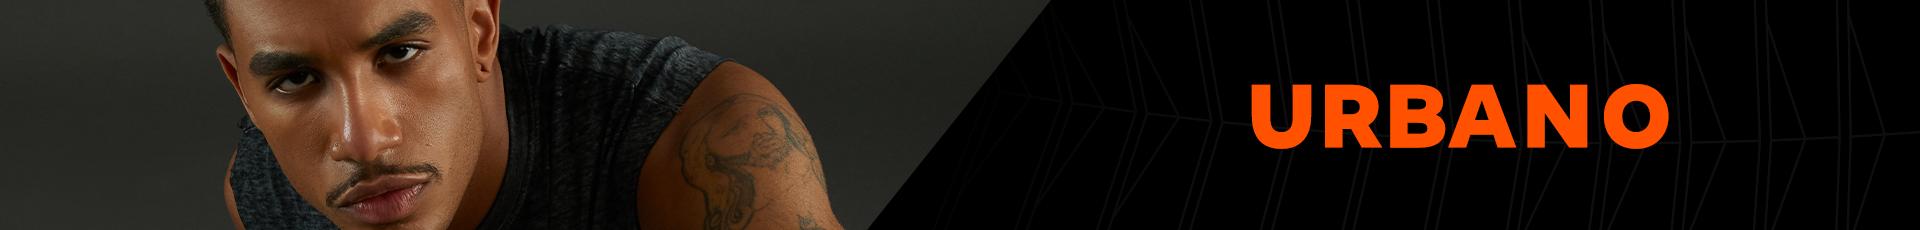 banner-desktop-urbano-uso